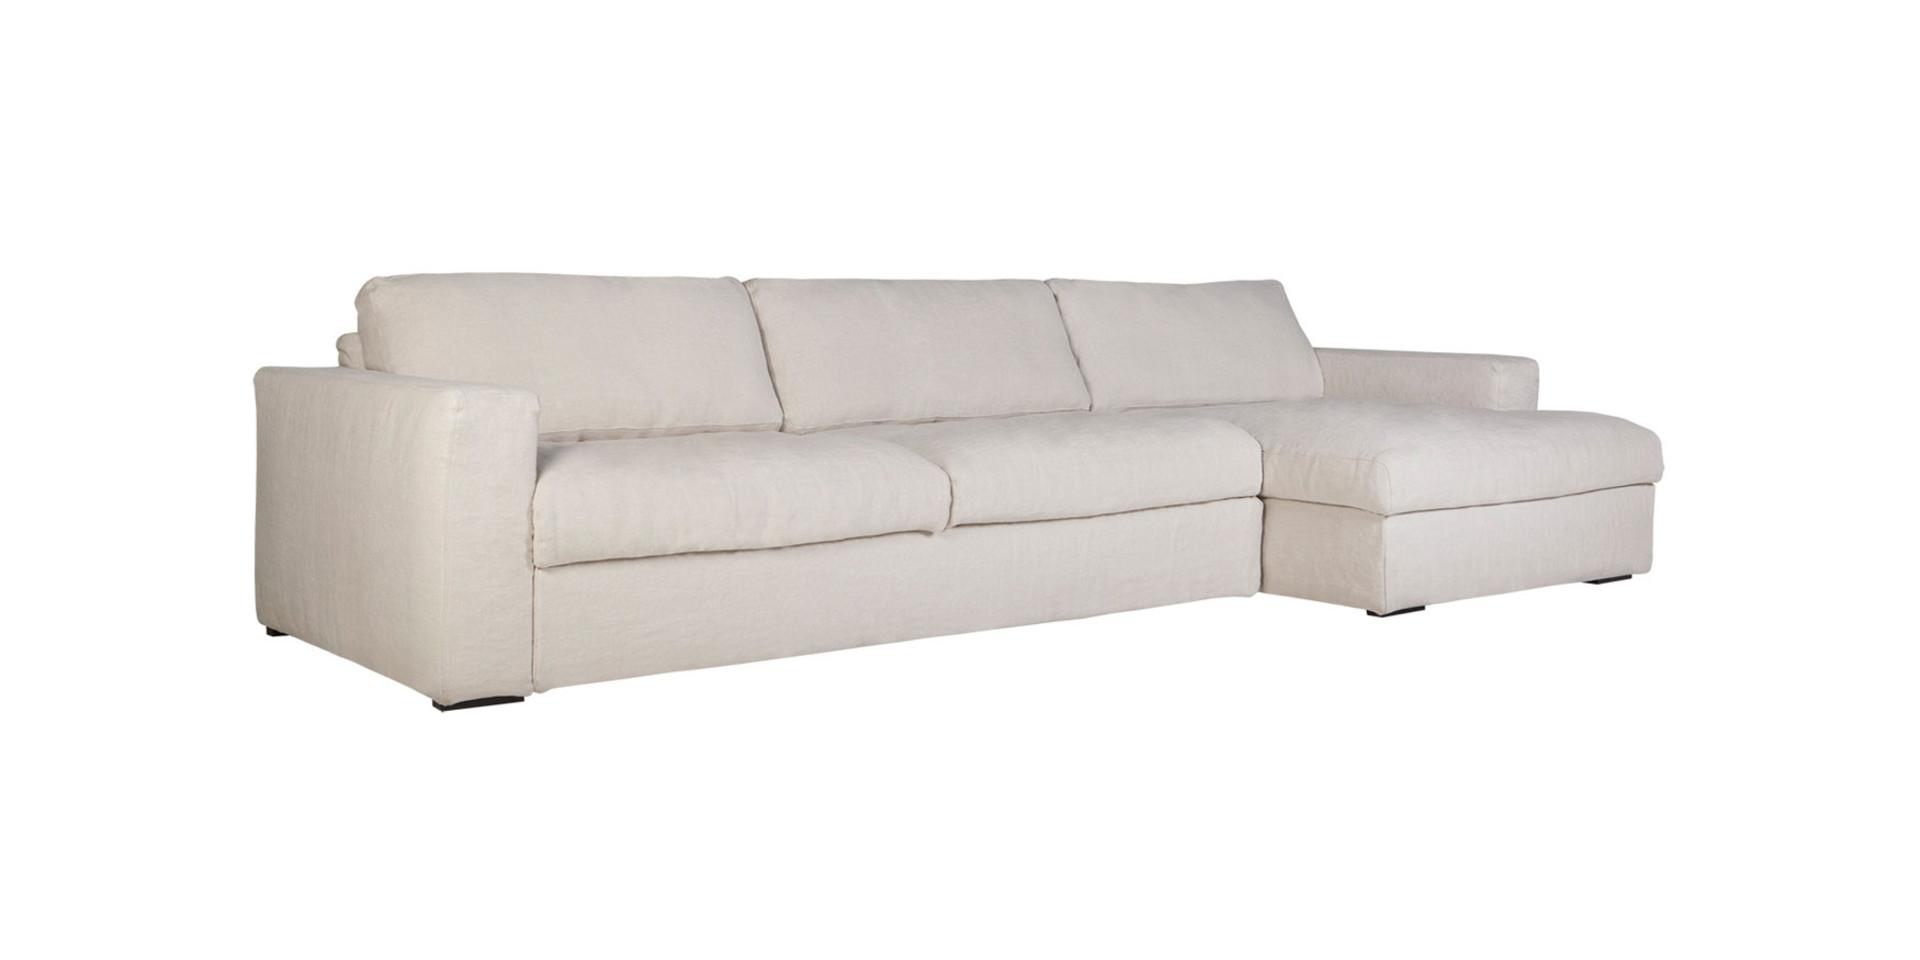 sits-linda-angle-chaiselongue93left_3seaterright_linen_natur_2